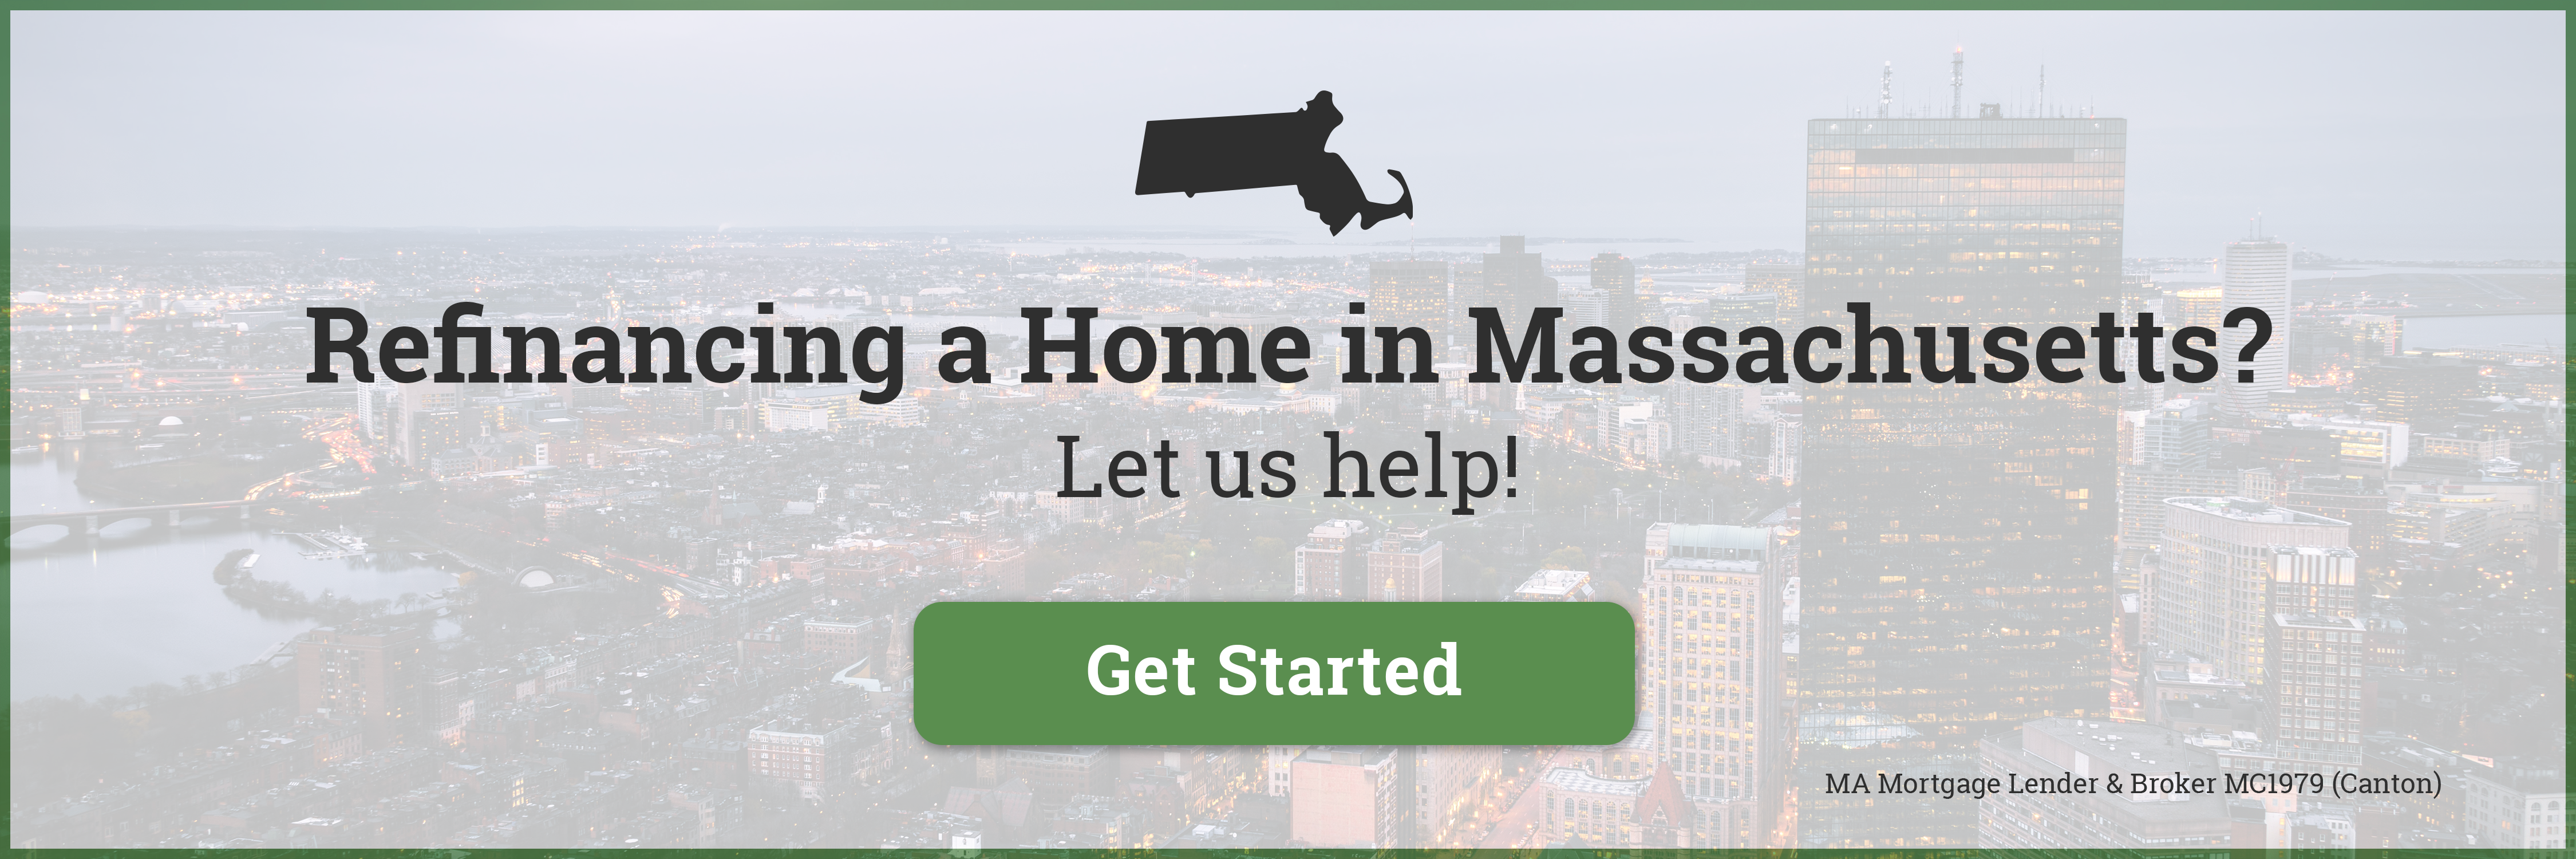 Refinancing a Home in Massachusetts?